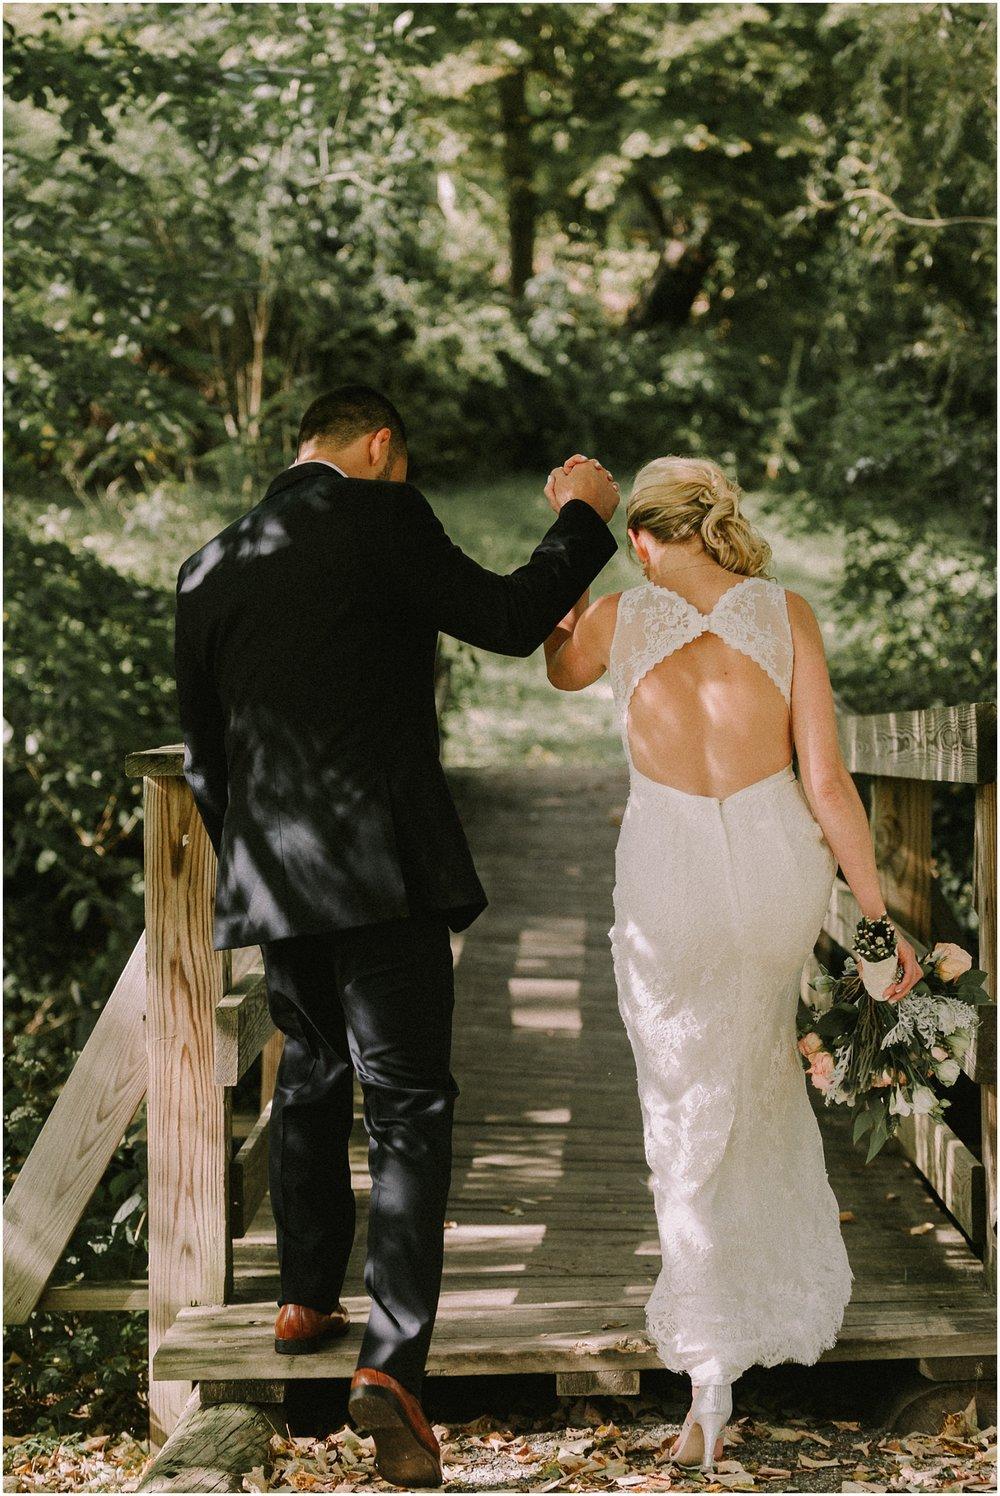 waterloo-village-waterloo village-wedding-outdoor wedding-rustic-boemian-new jersey-bride-groom-wedding party-davids bridal-wedding dress-wedding-first kiss-intimate wedding_0361.jpg